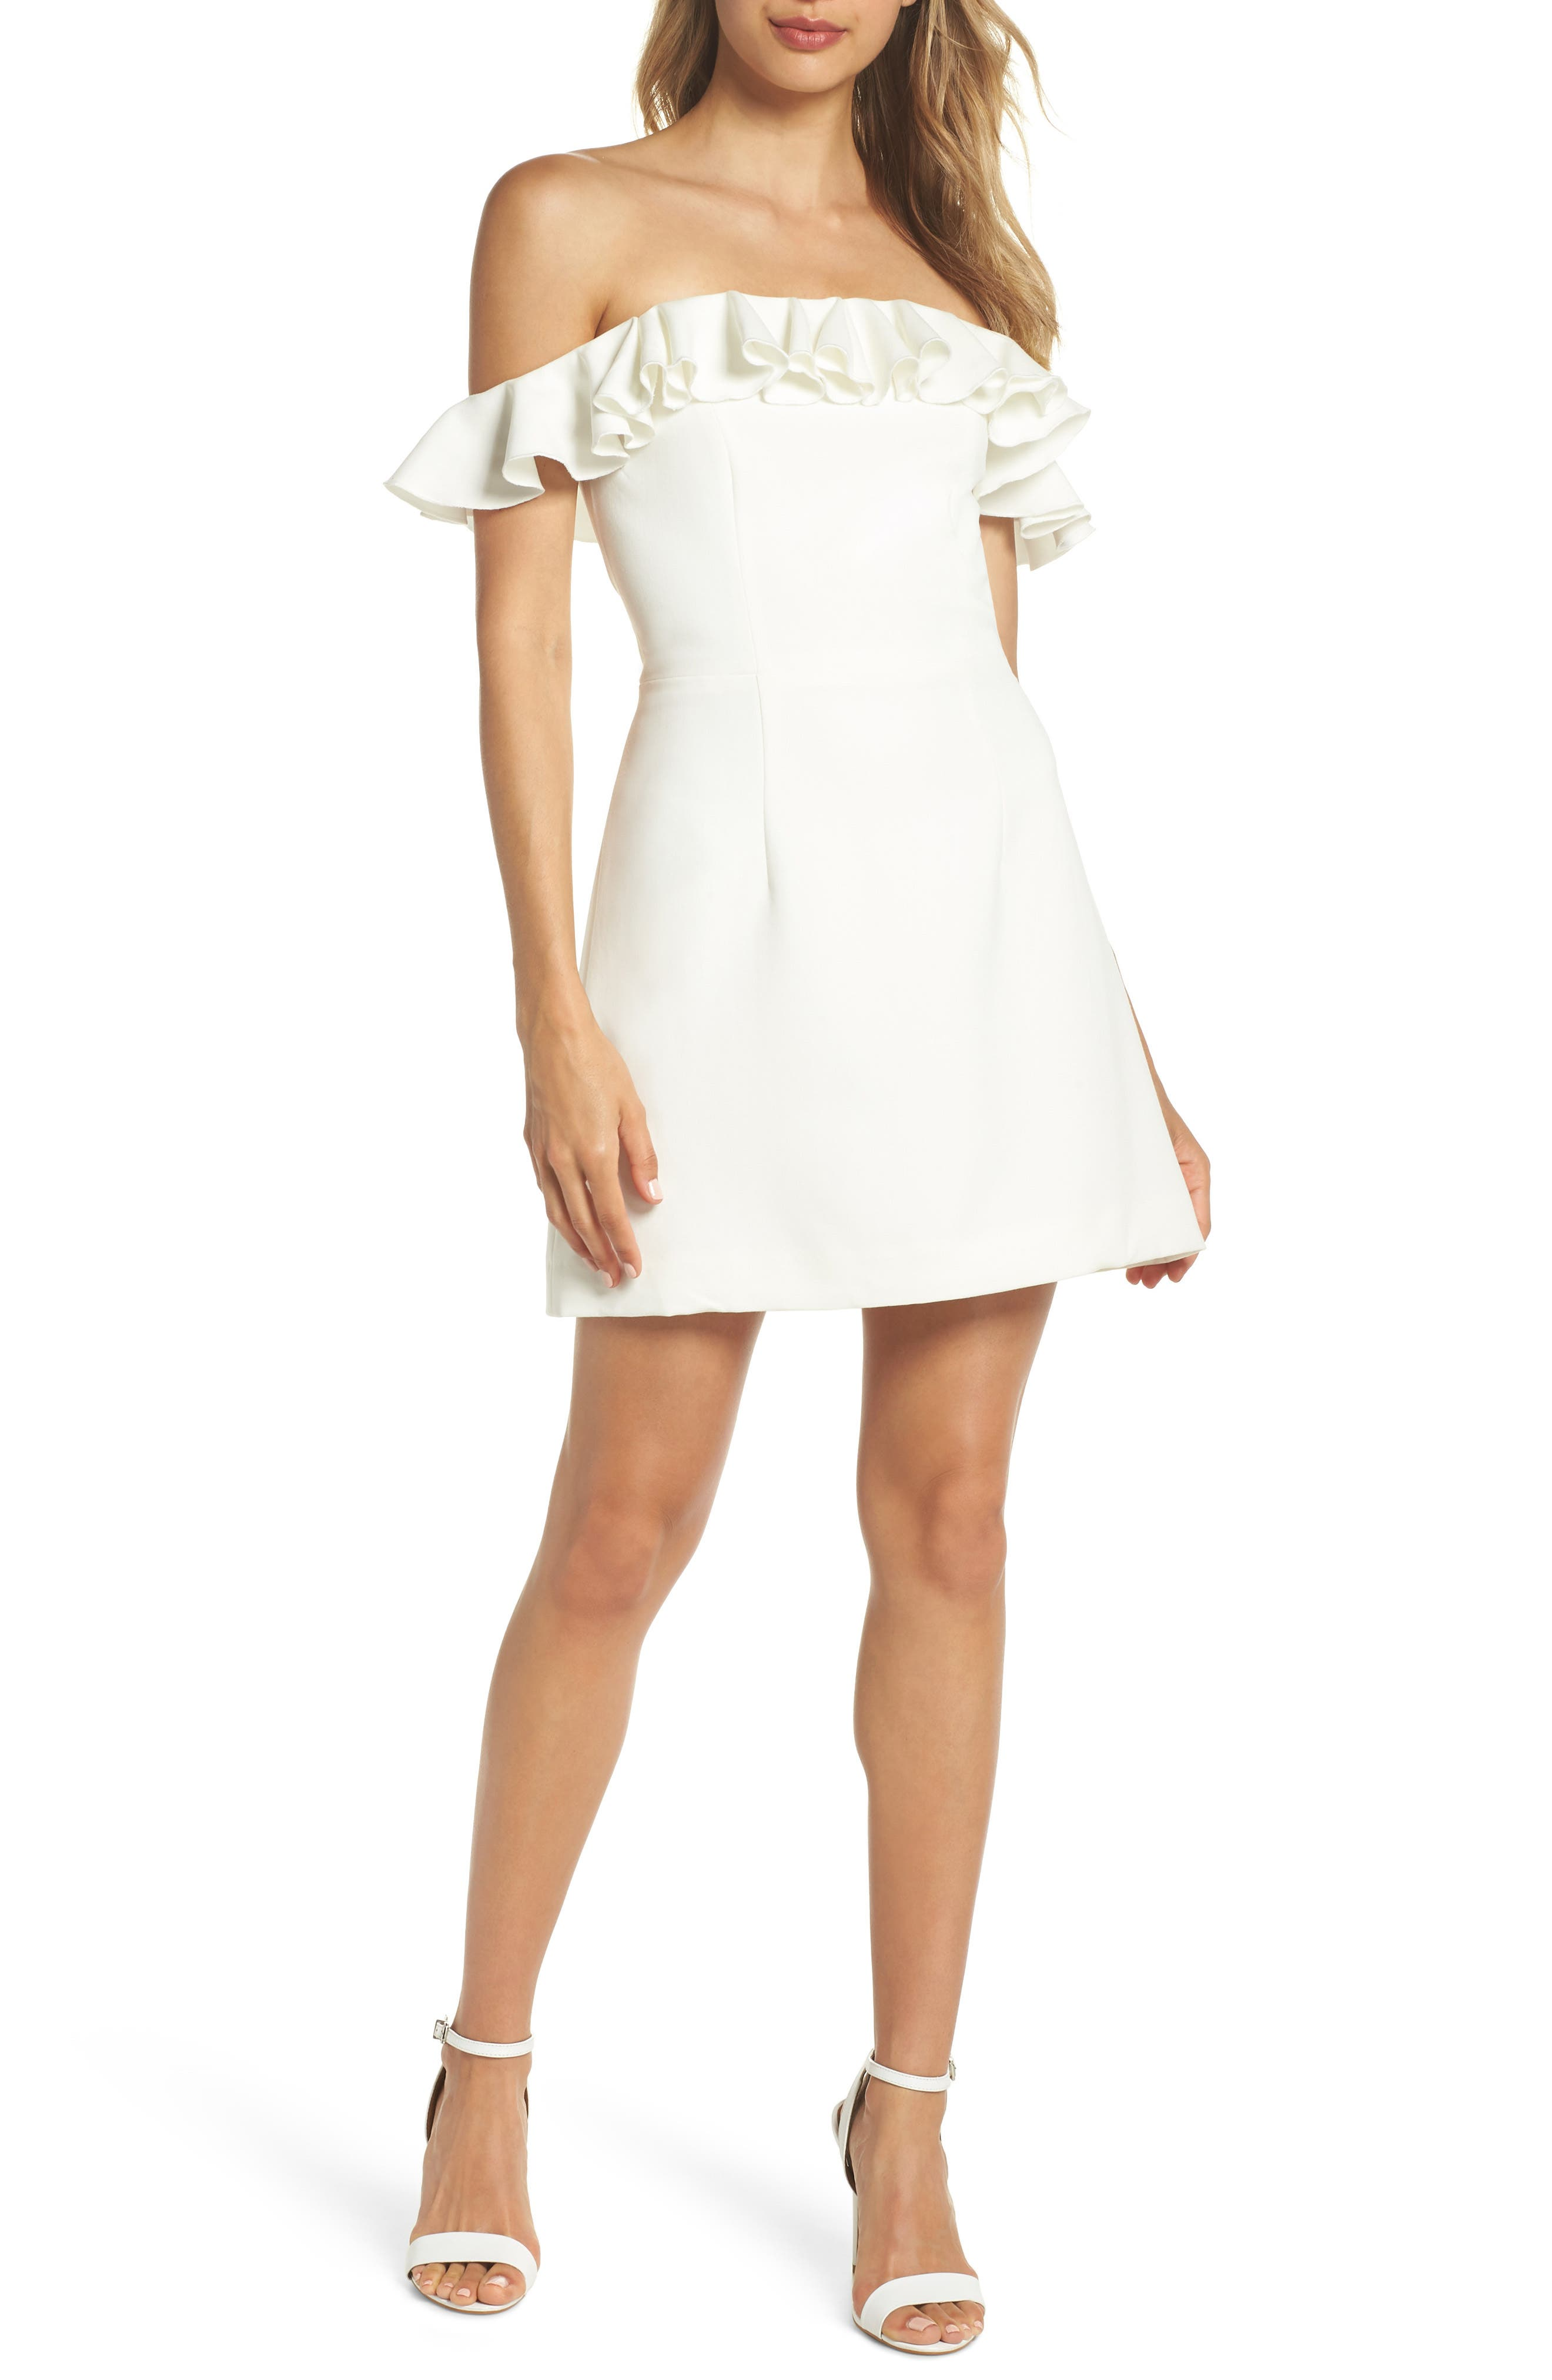 Strapless White Cocktail Dress